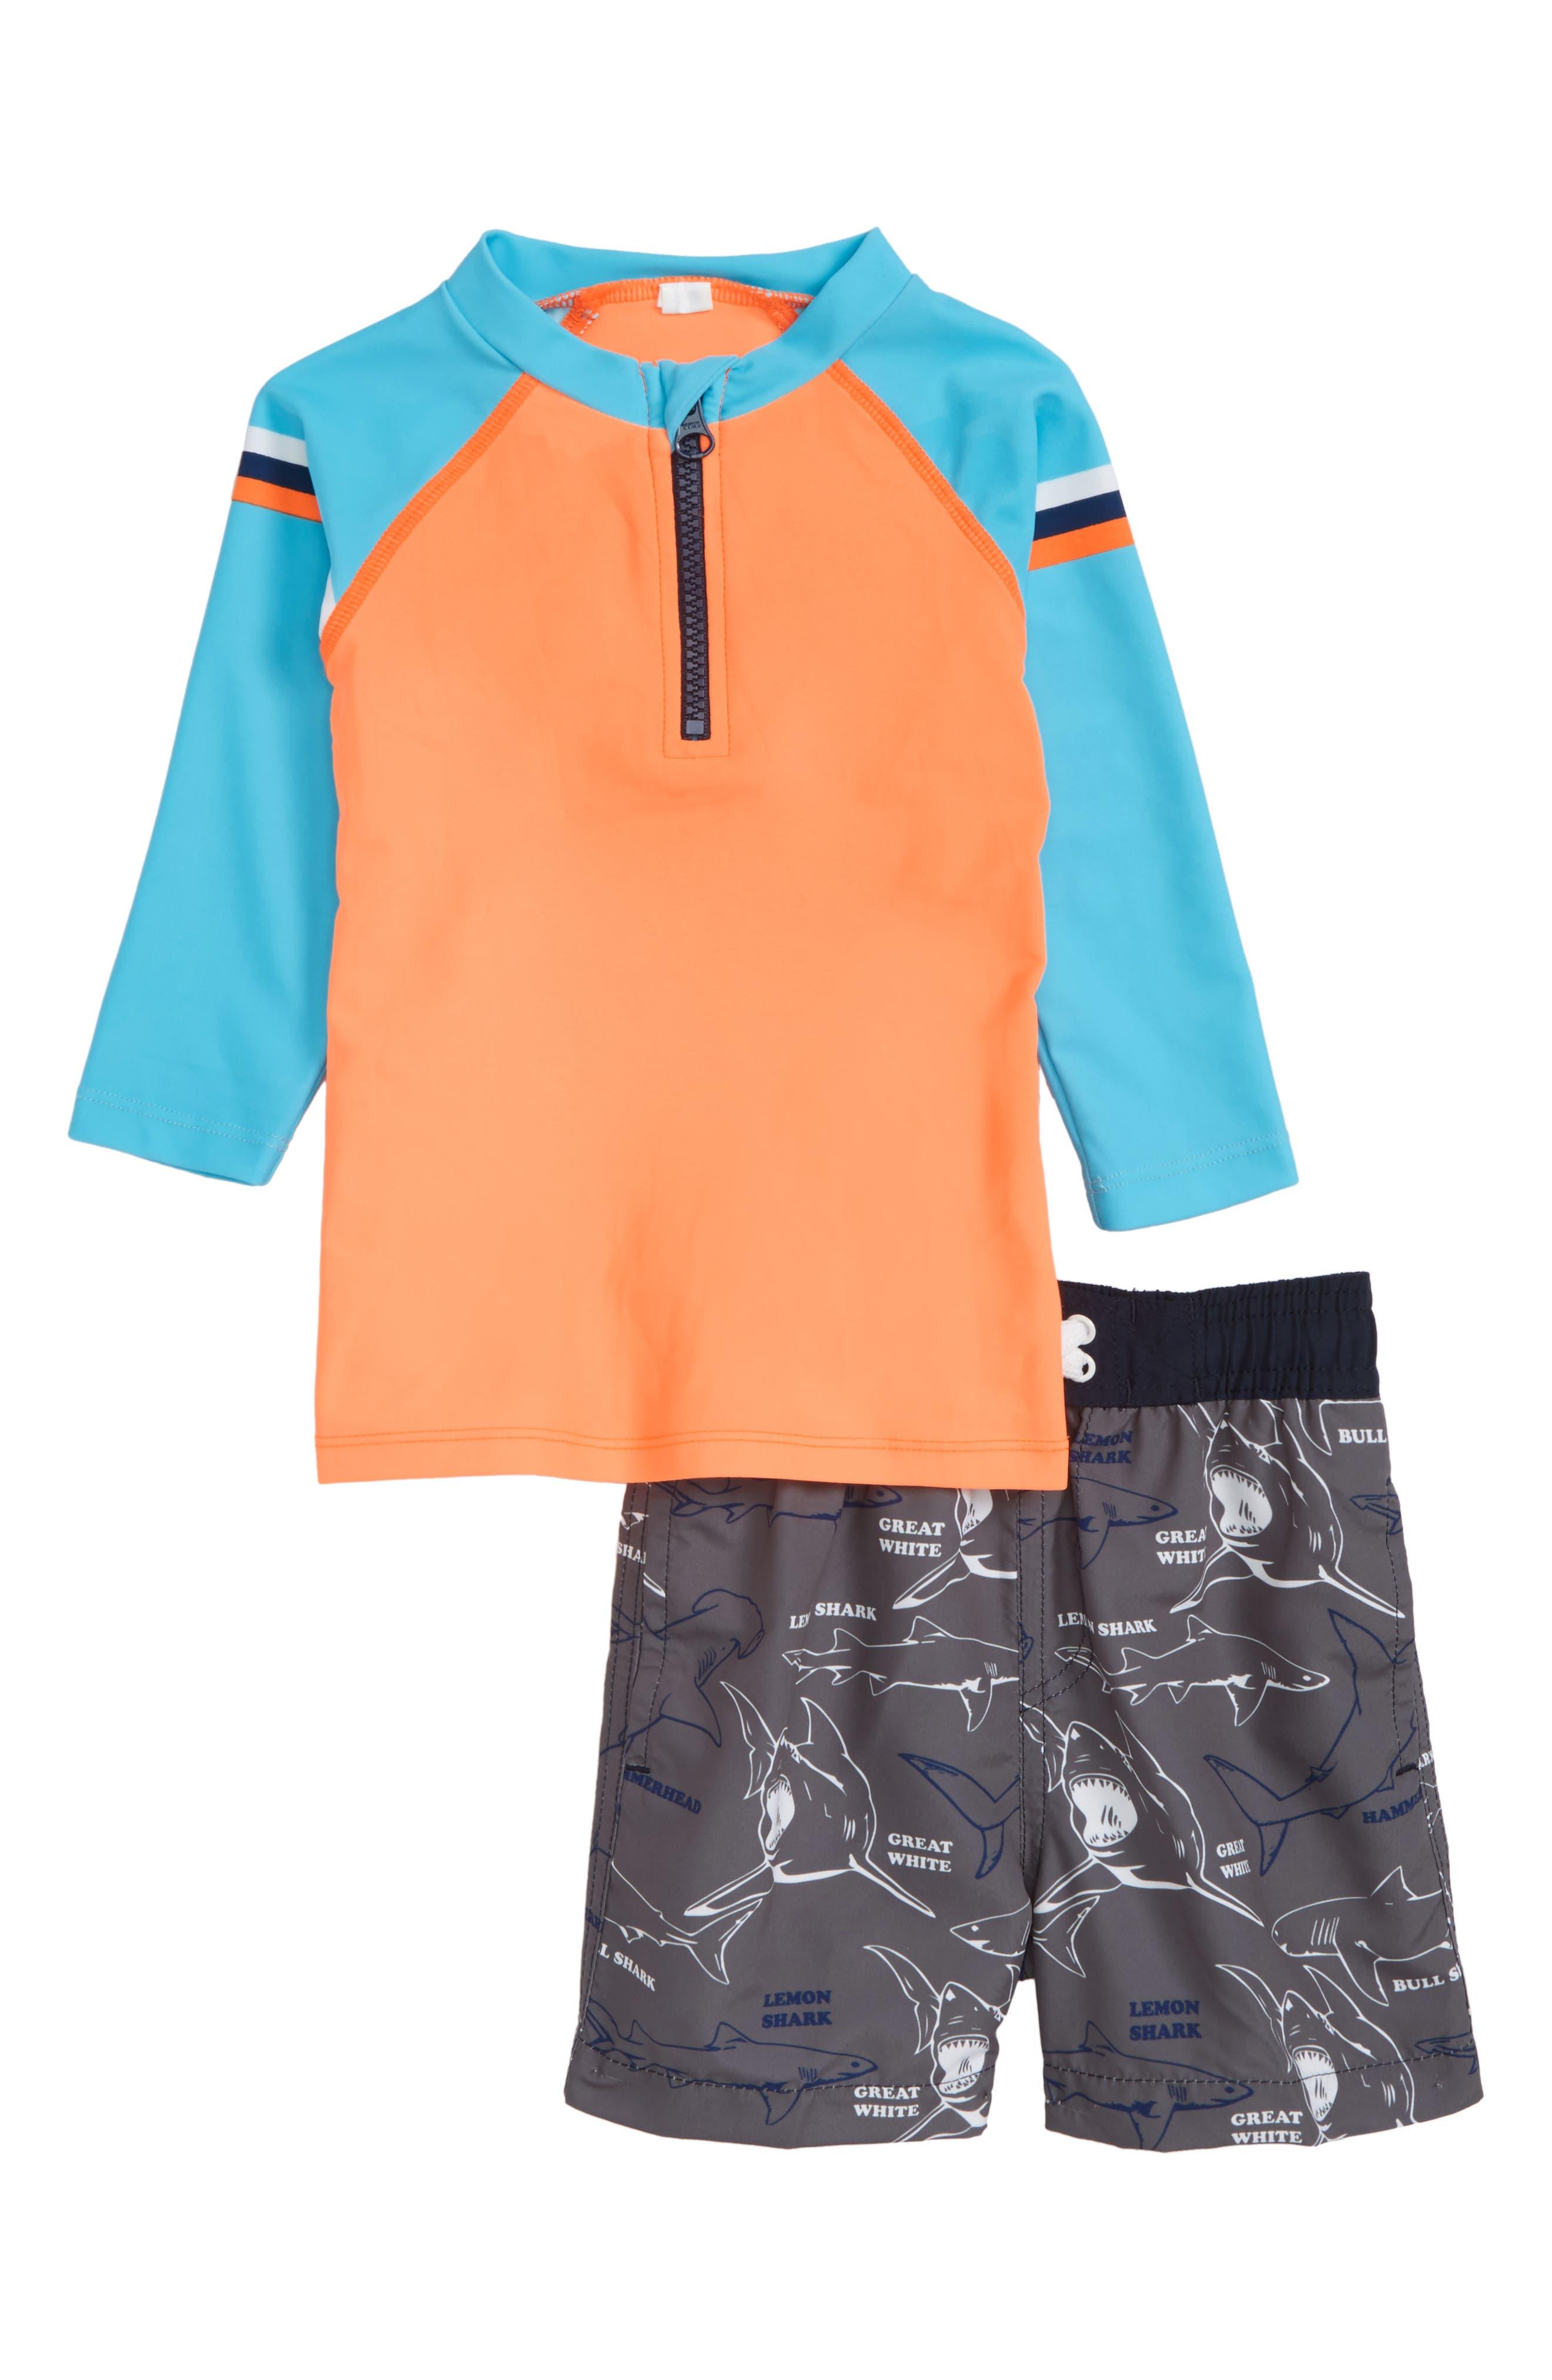 Catch Me if You Can Two-Piece Rashguard Swimsuit,                             Main thumbnail 1, color,                             Orange